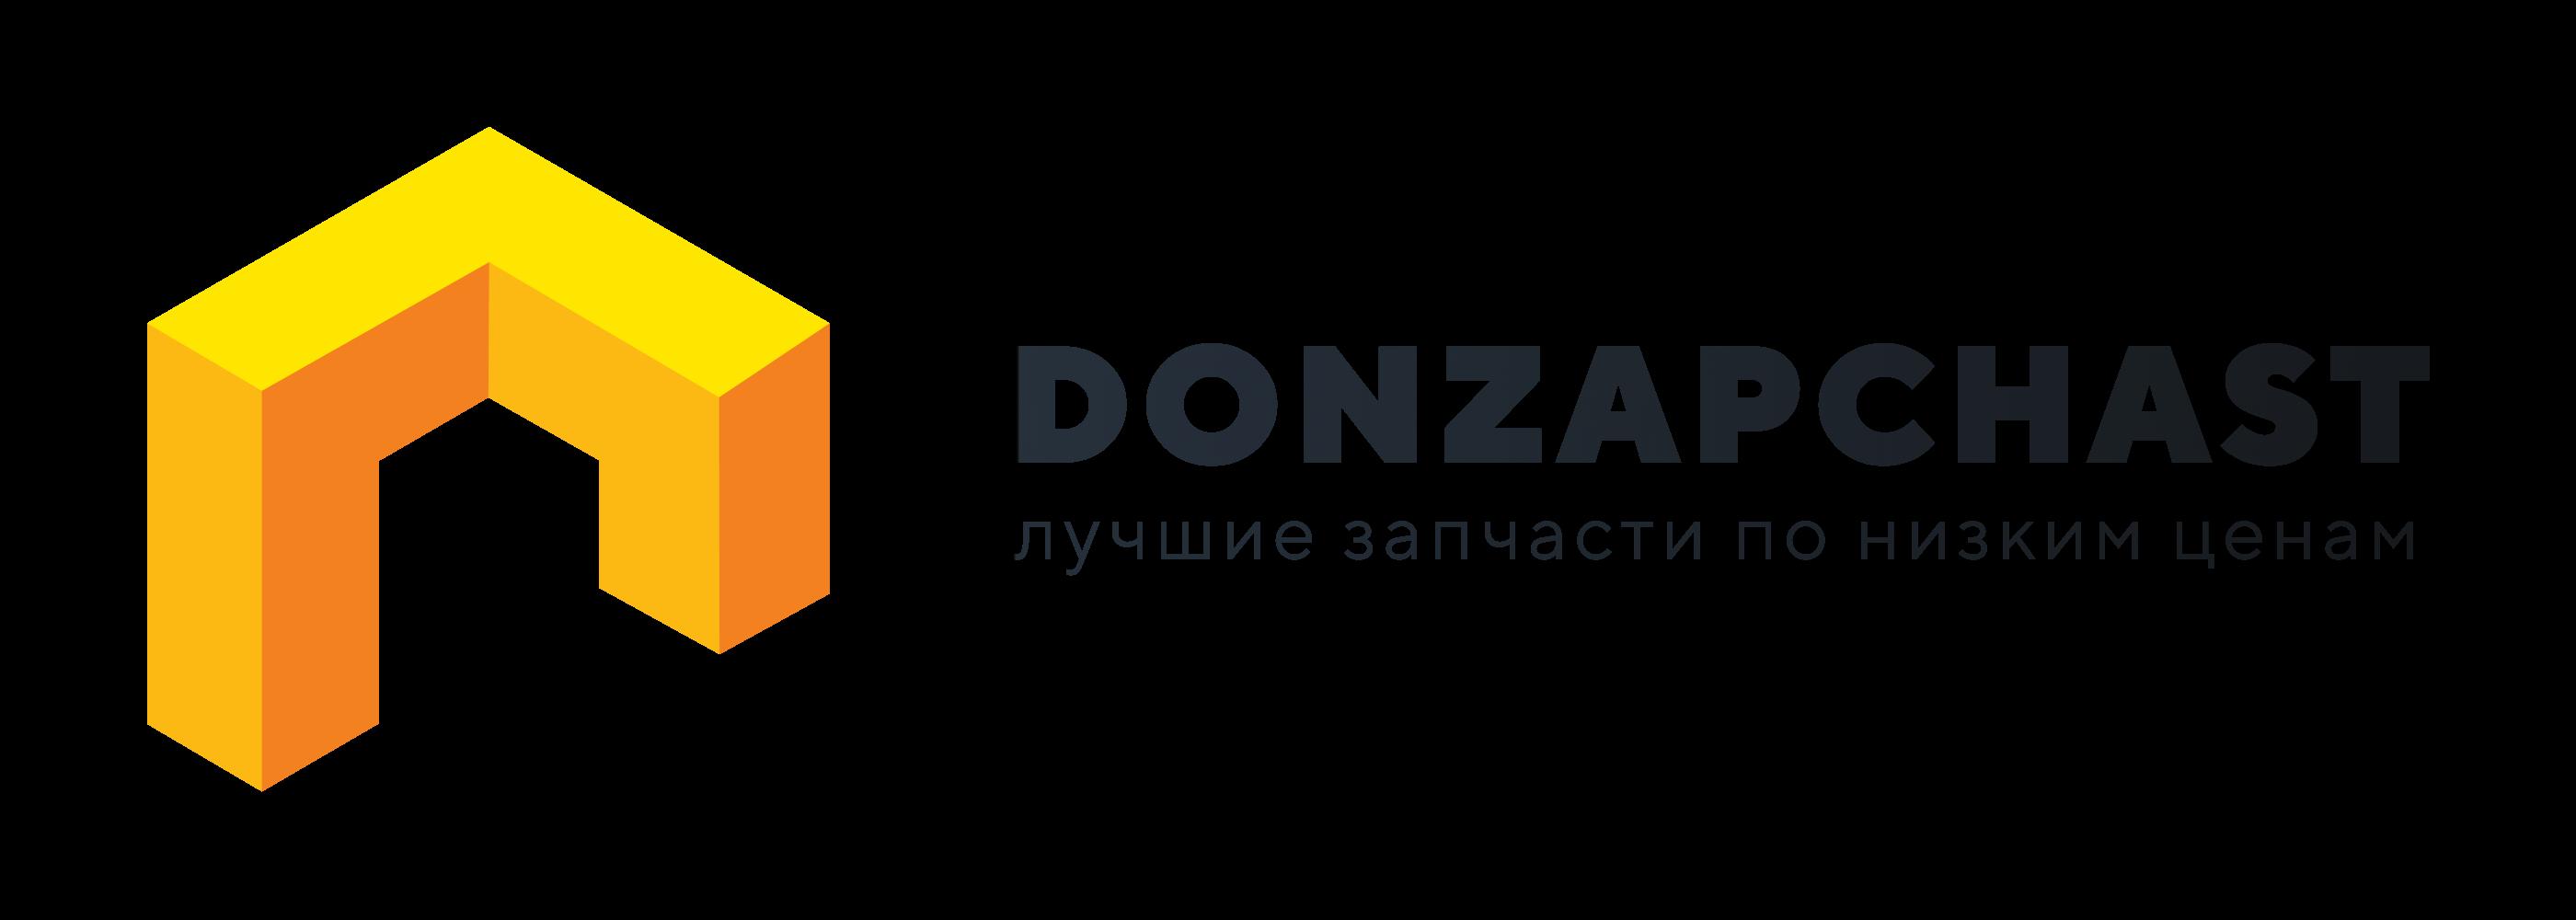 Donzapchast